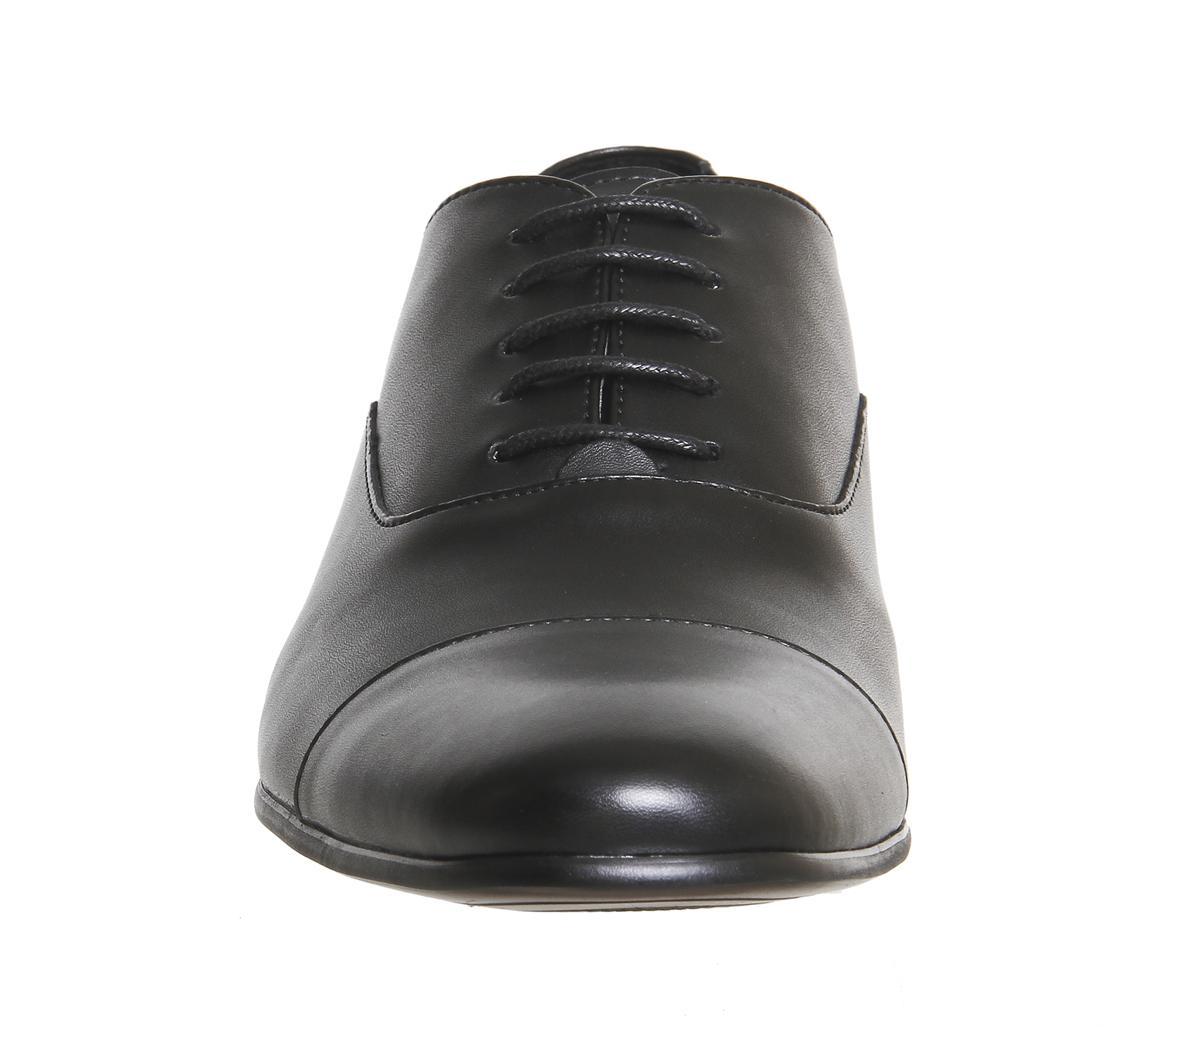 Office Flounder Toe Cap Black Leather